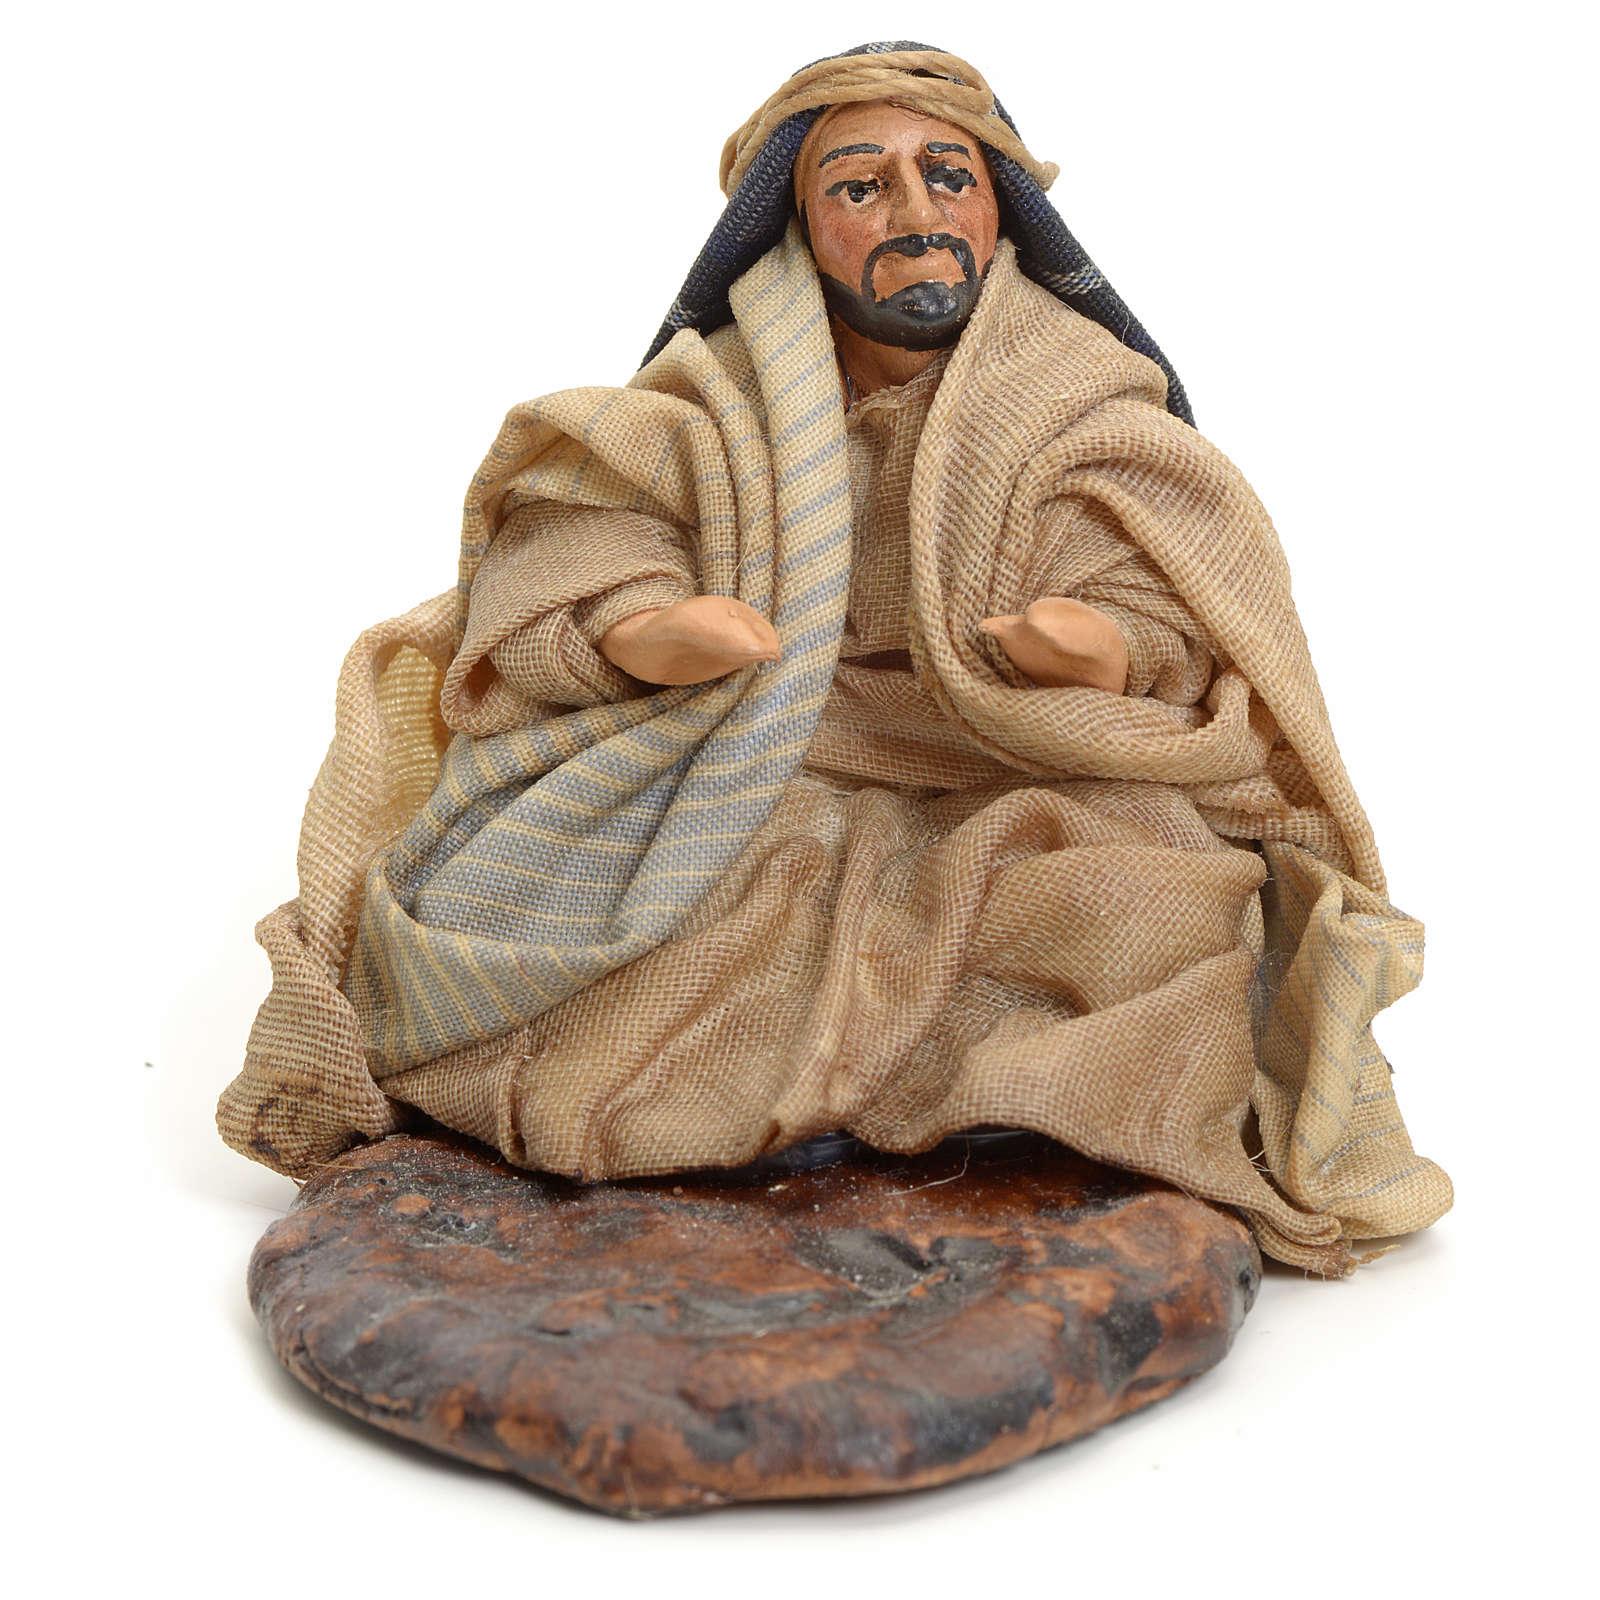 Neapolitan nativity figurine, Arabian man warming up, 8cm 4